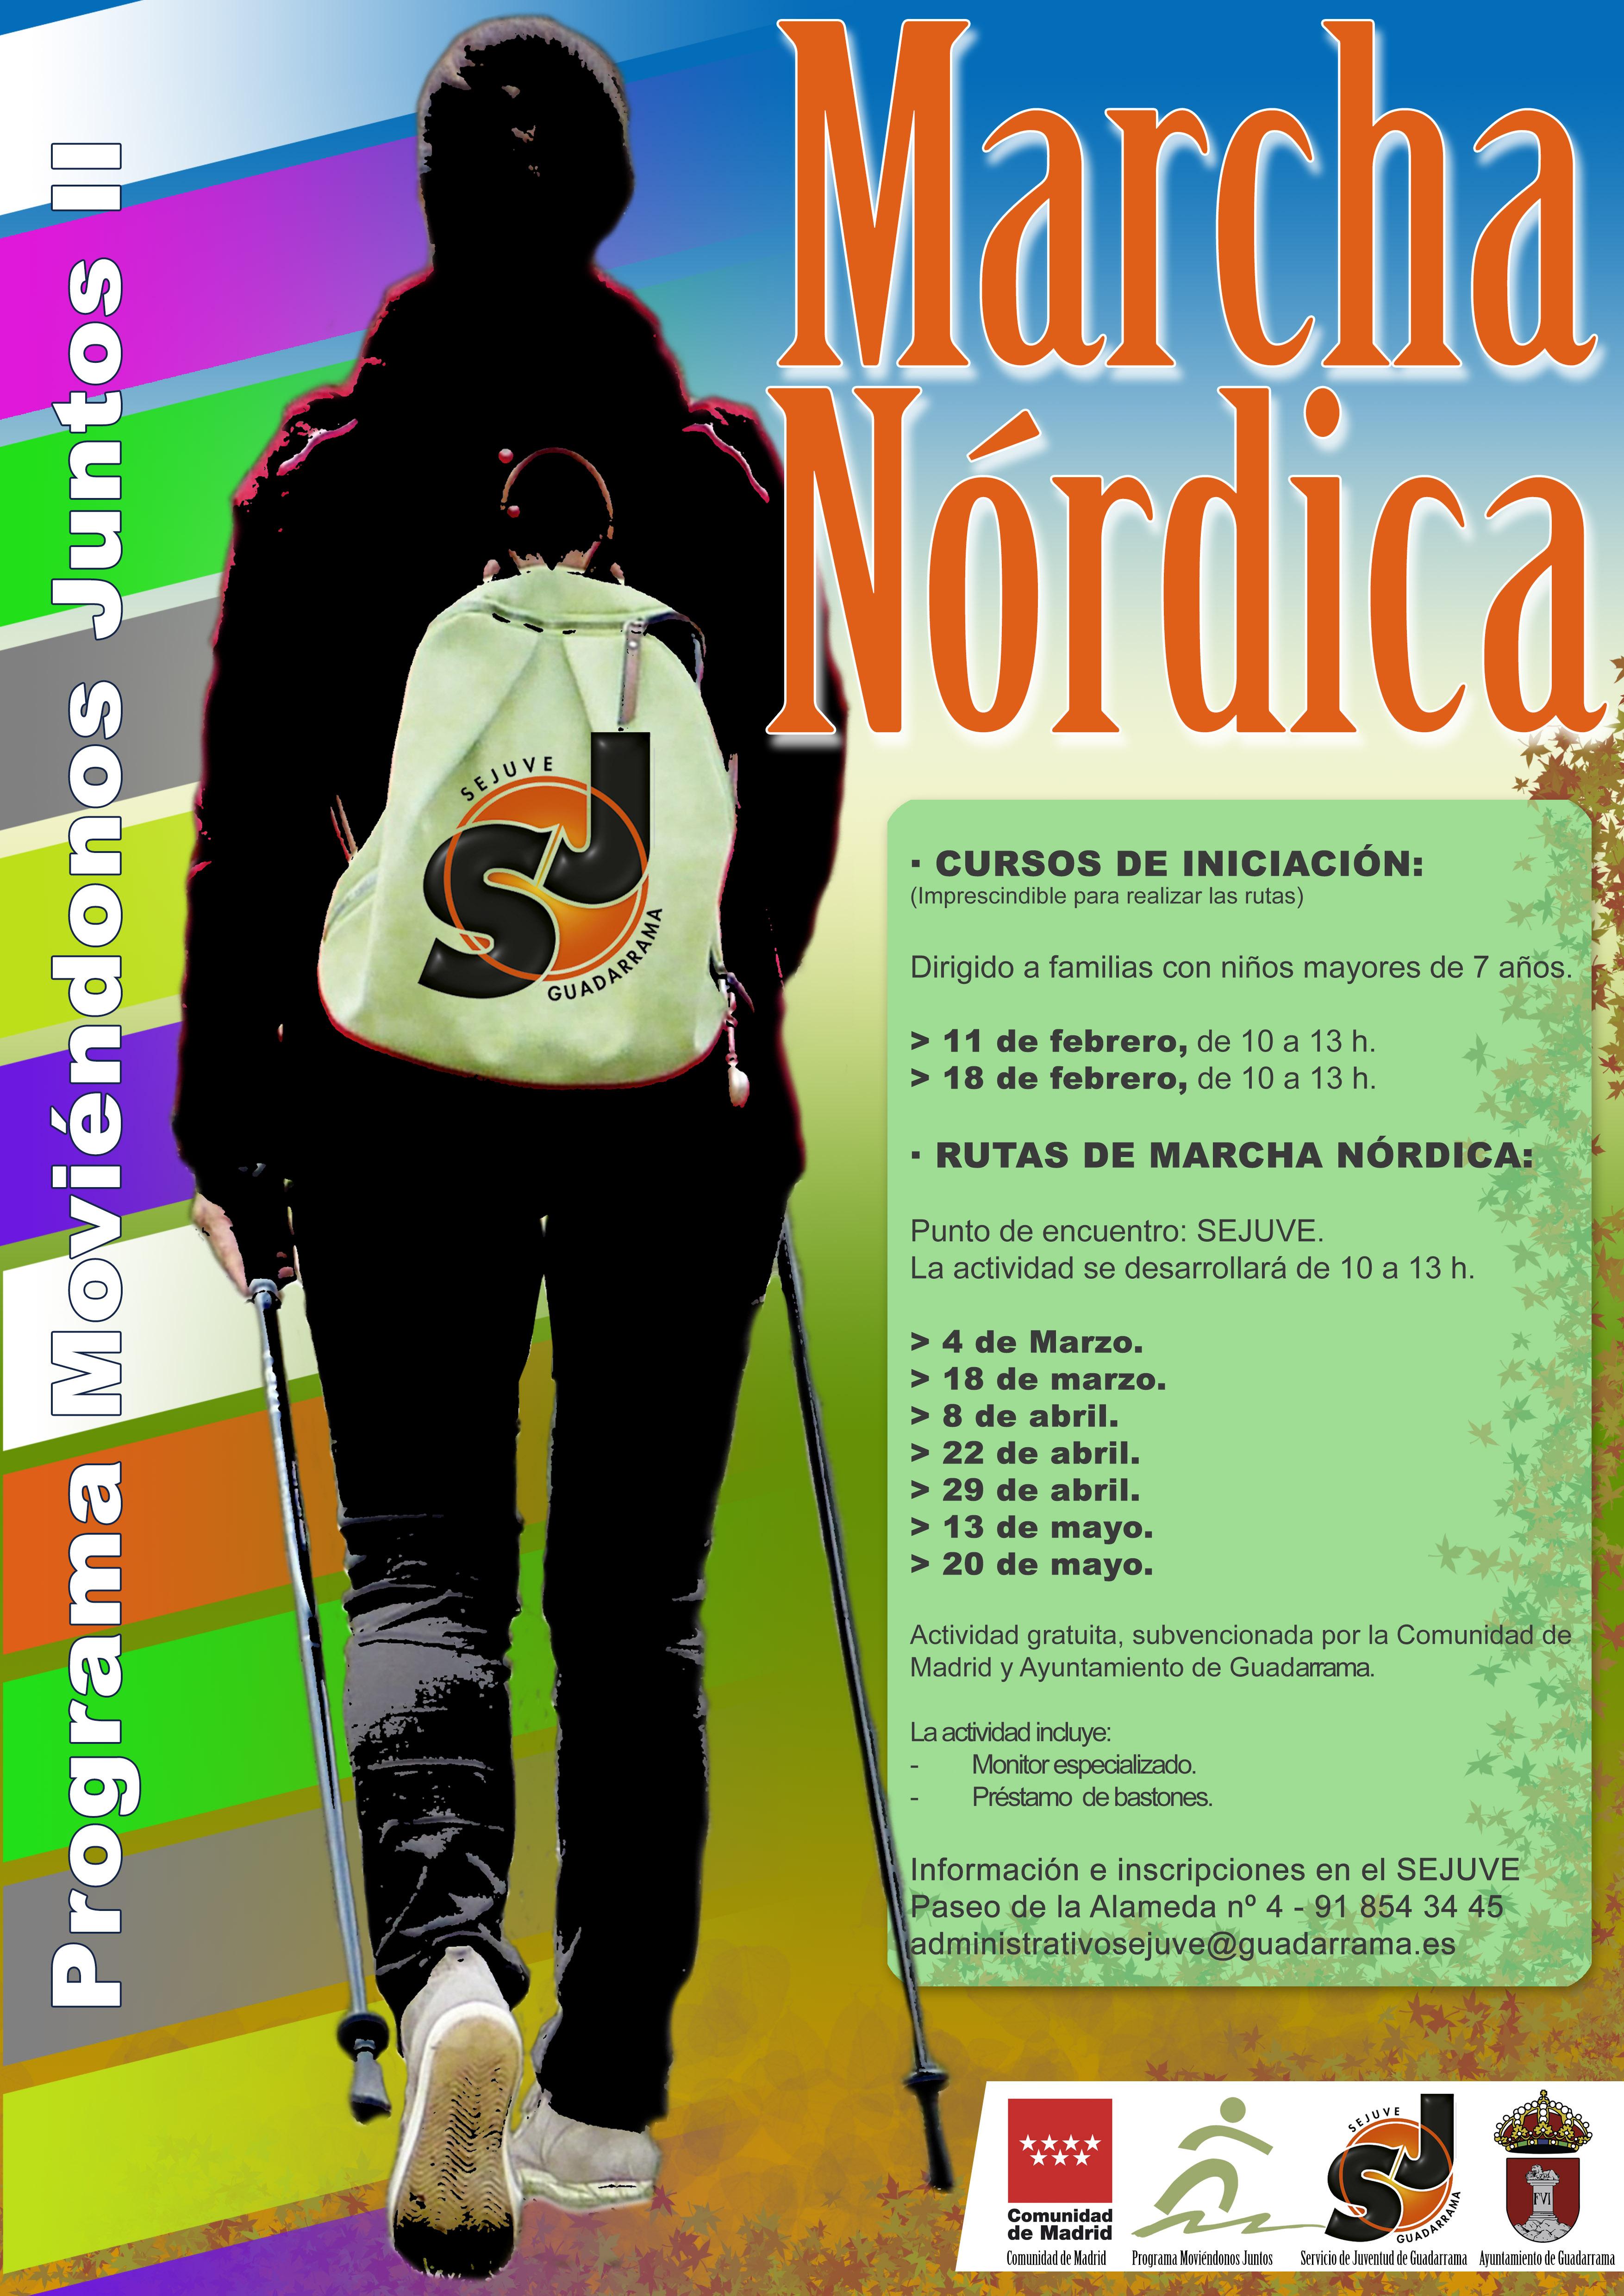 Marcha Nórdica